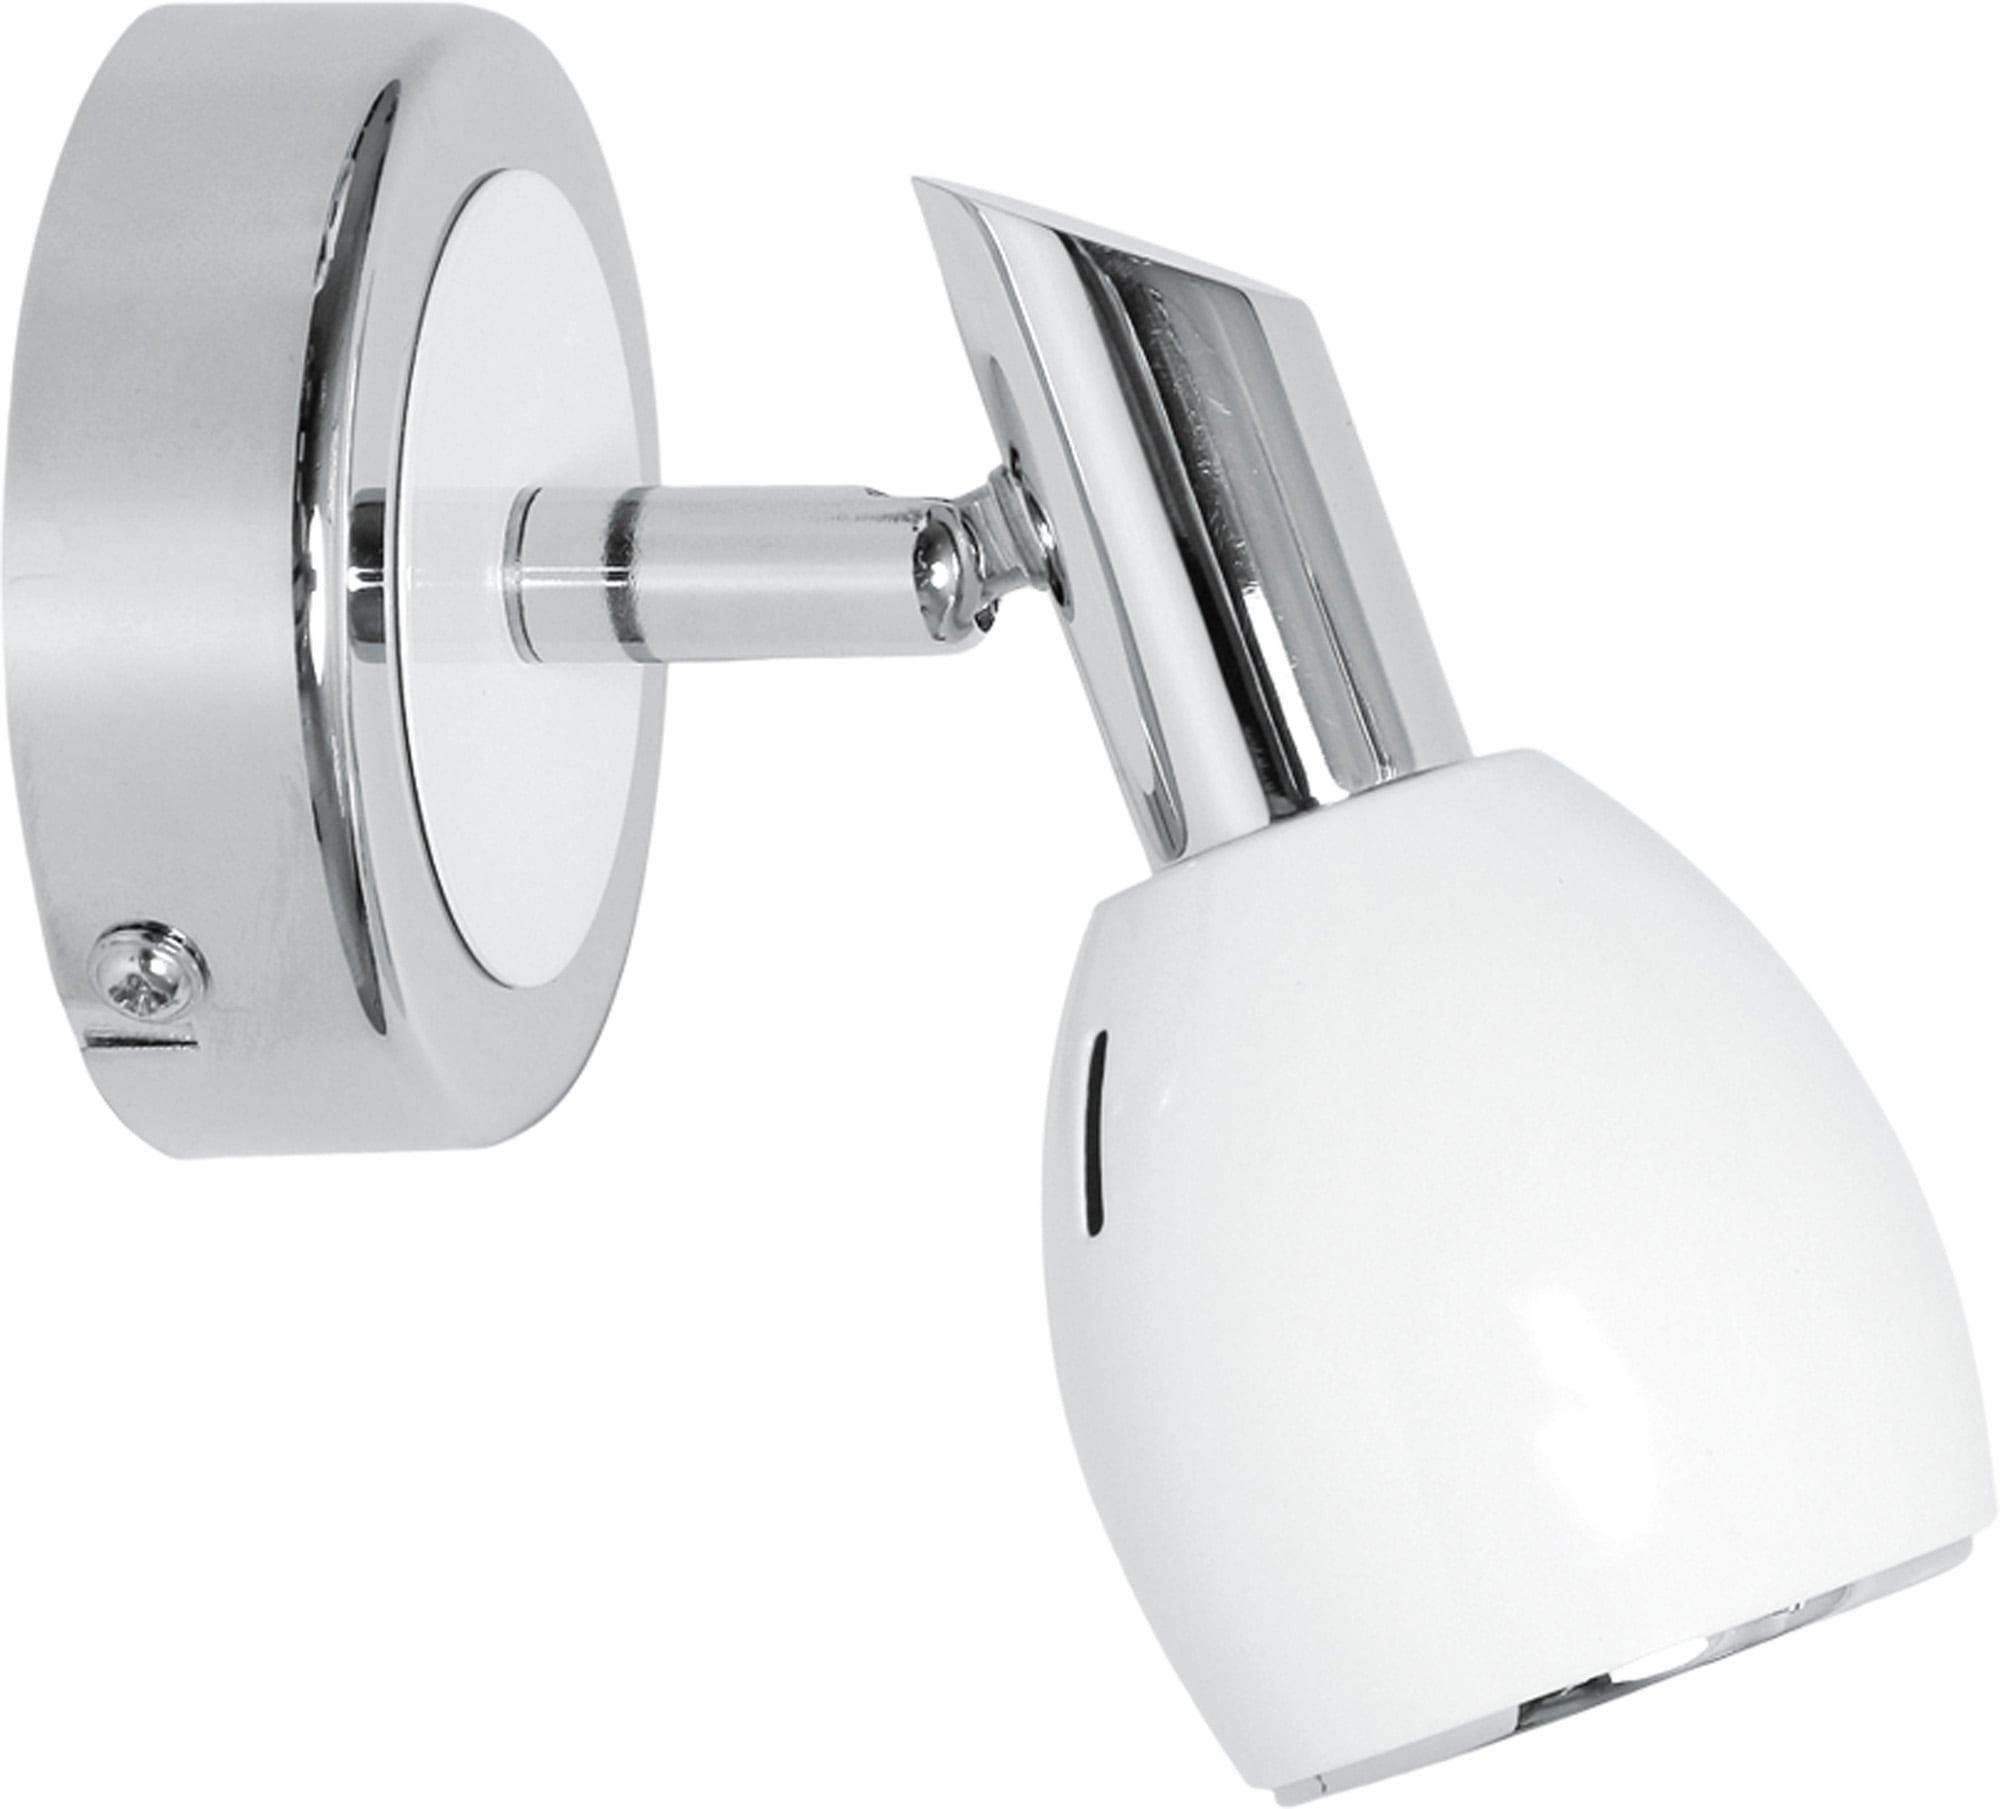 Kinkiet Biały LED Colors chrom GU10